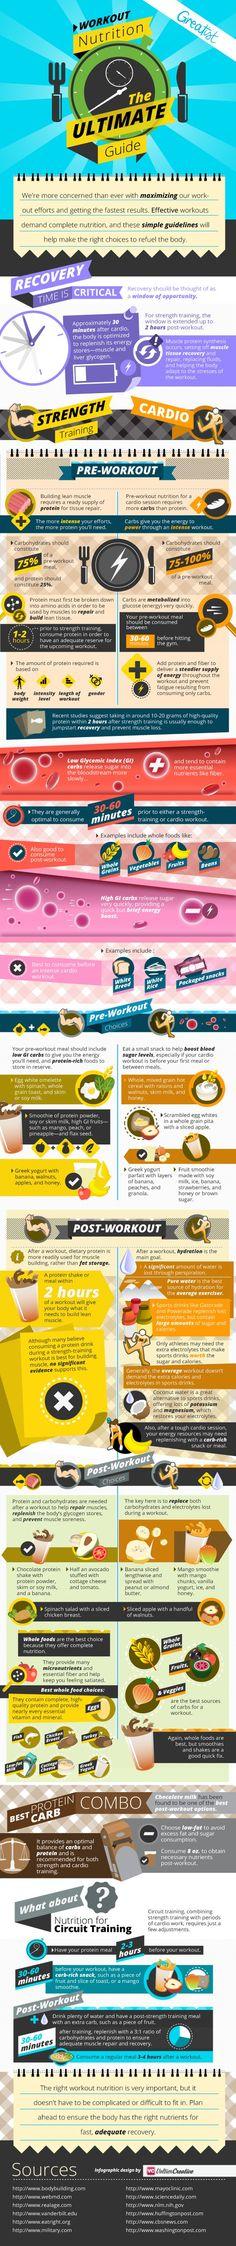 workout nutrition workout nutrition workout nutrition